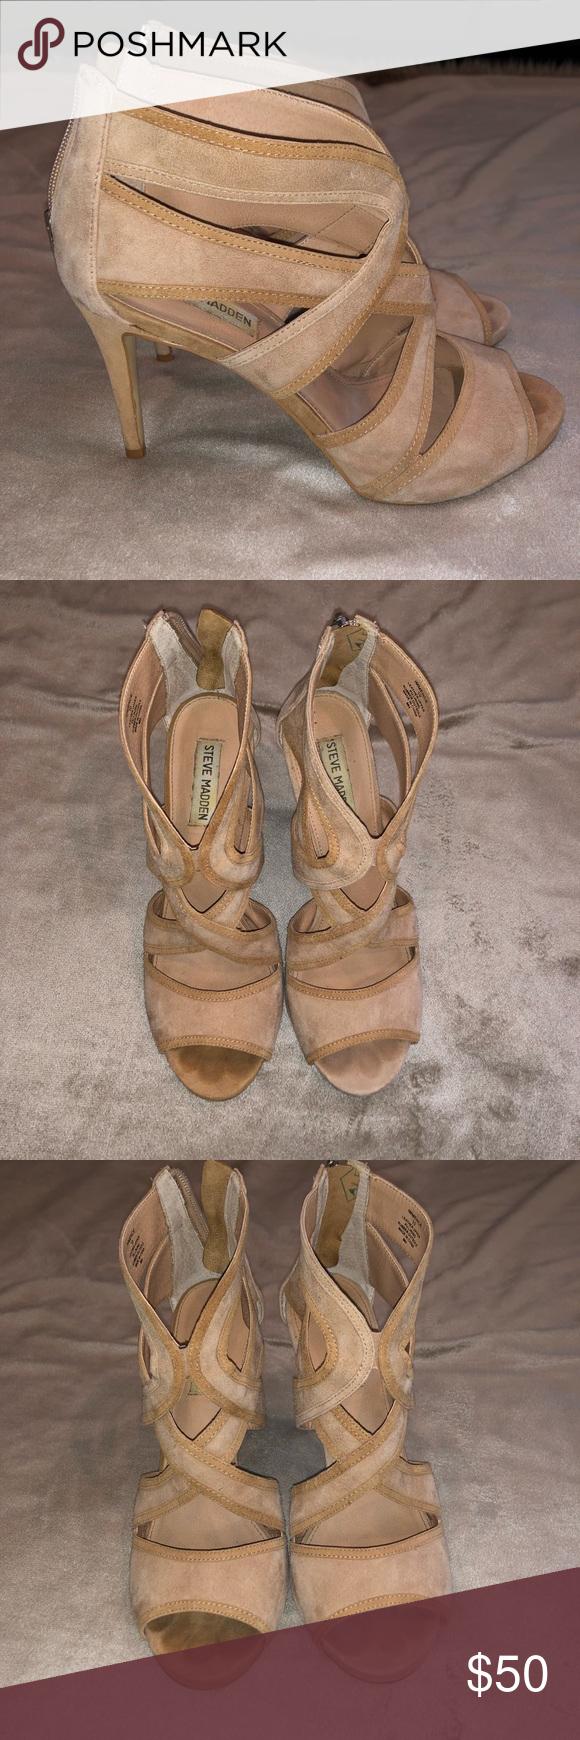 e2c5868bbb5 Steve Madden Immense Suede Heels Gently worn Steve Madden Suede heels.  Still in good condition